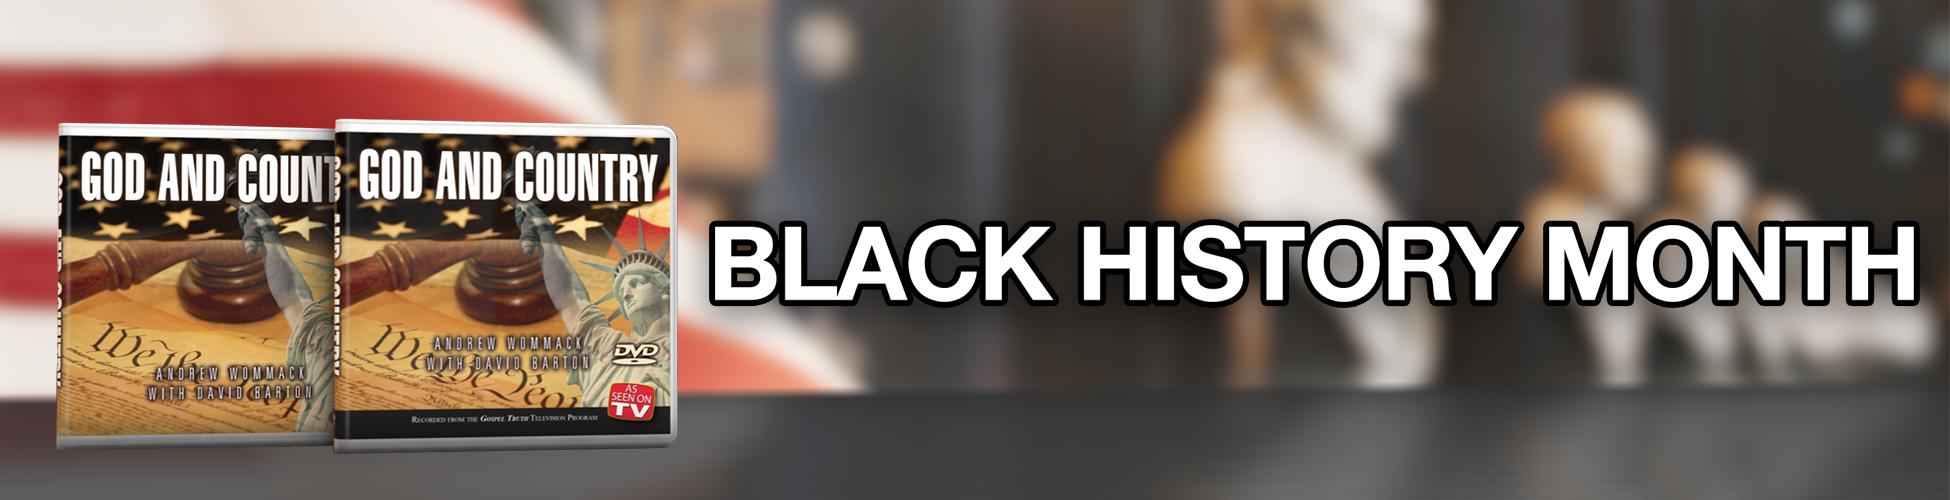 Black-History-Month-banner-1950x500-LG-1